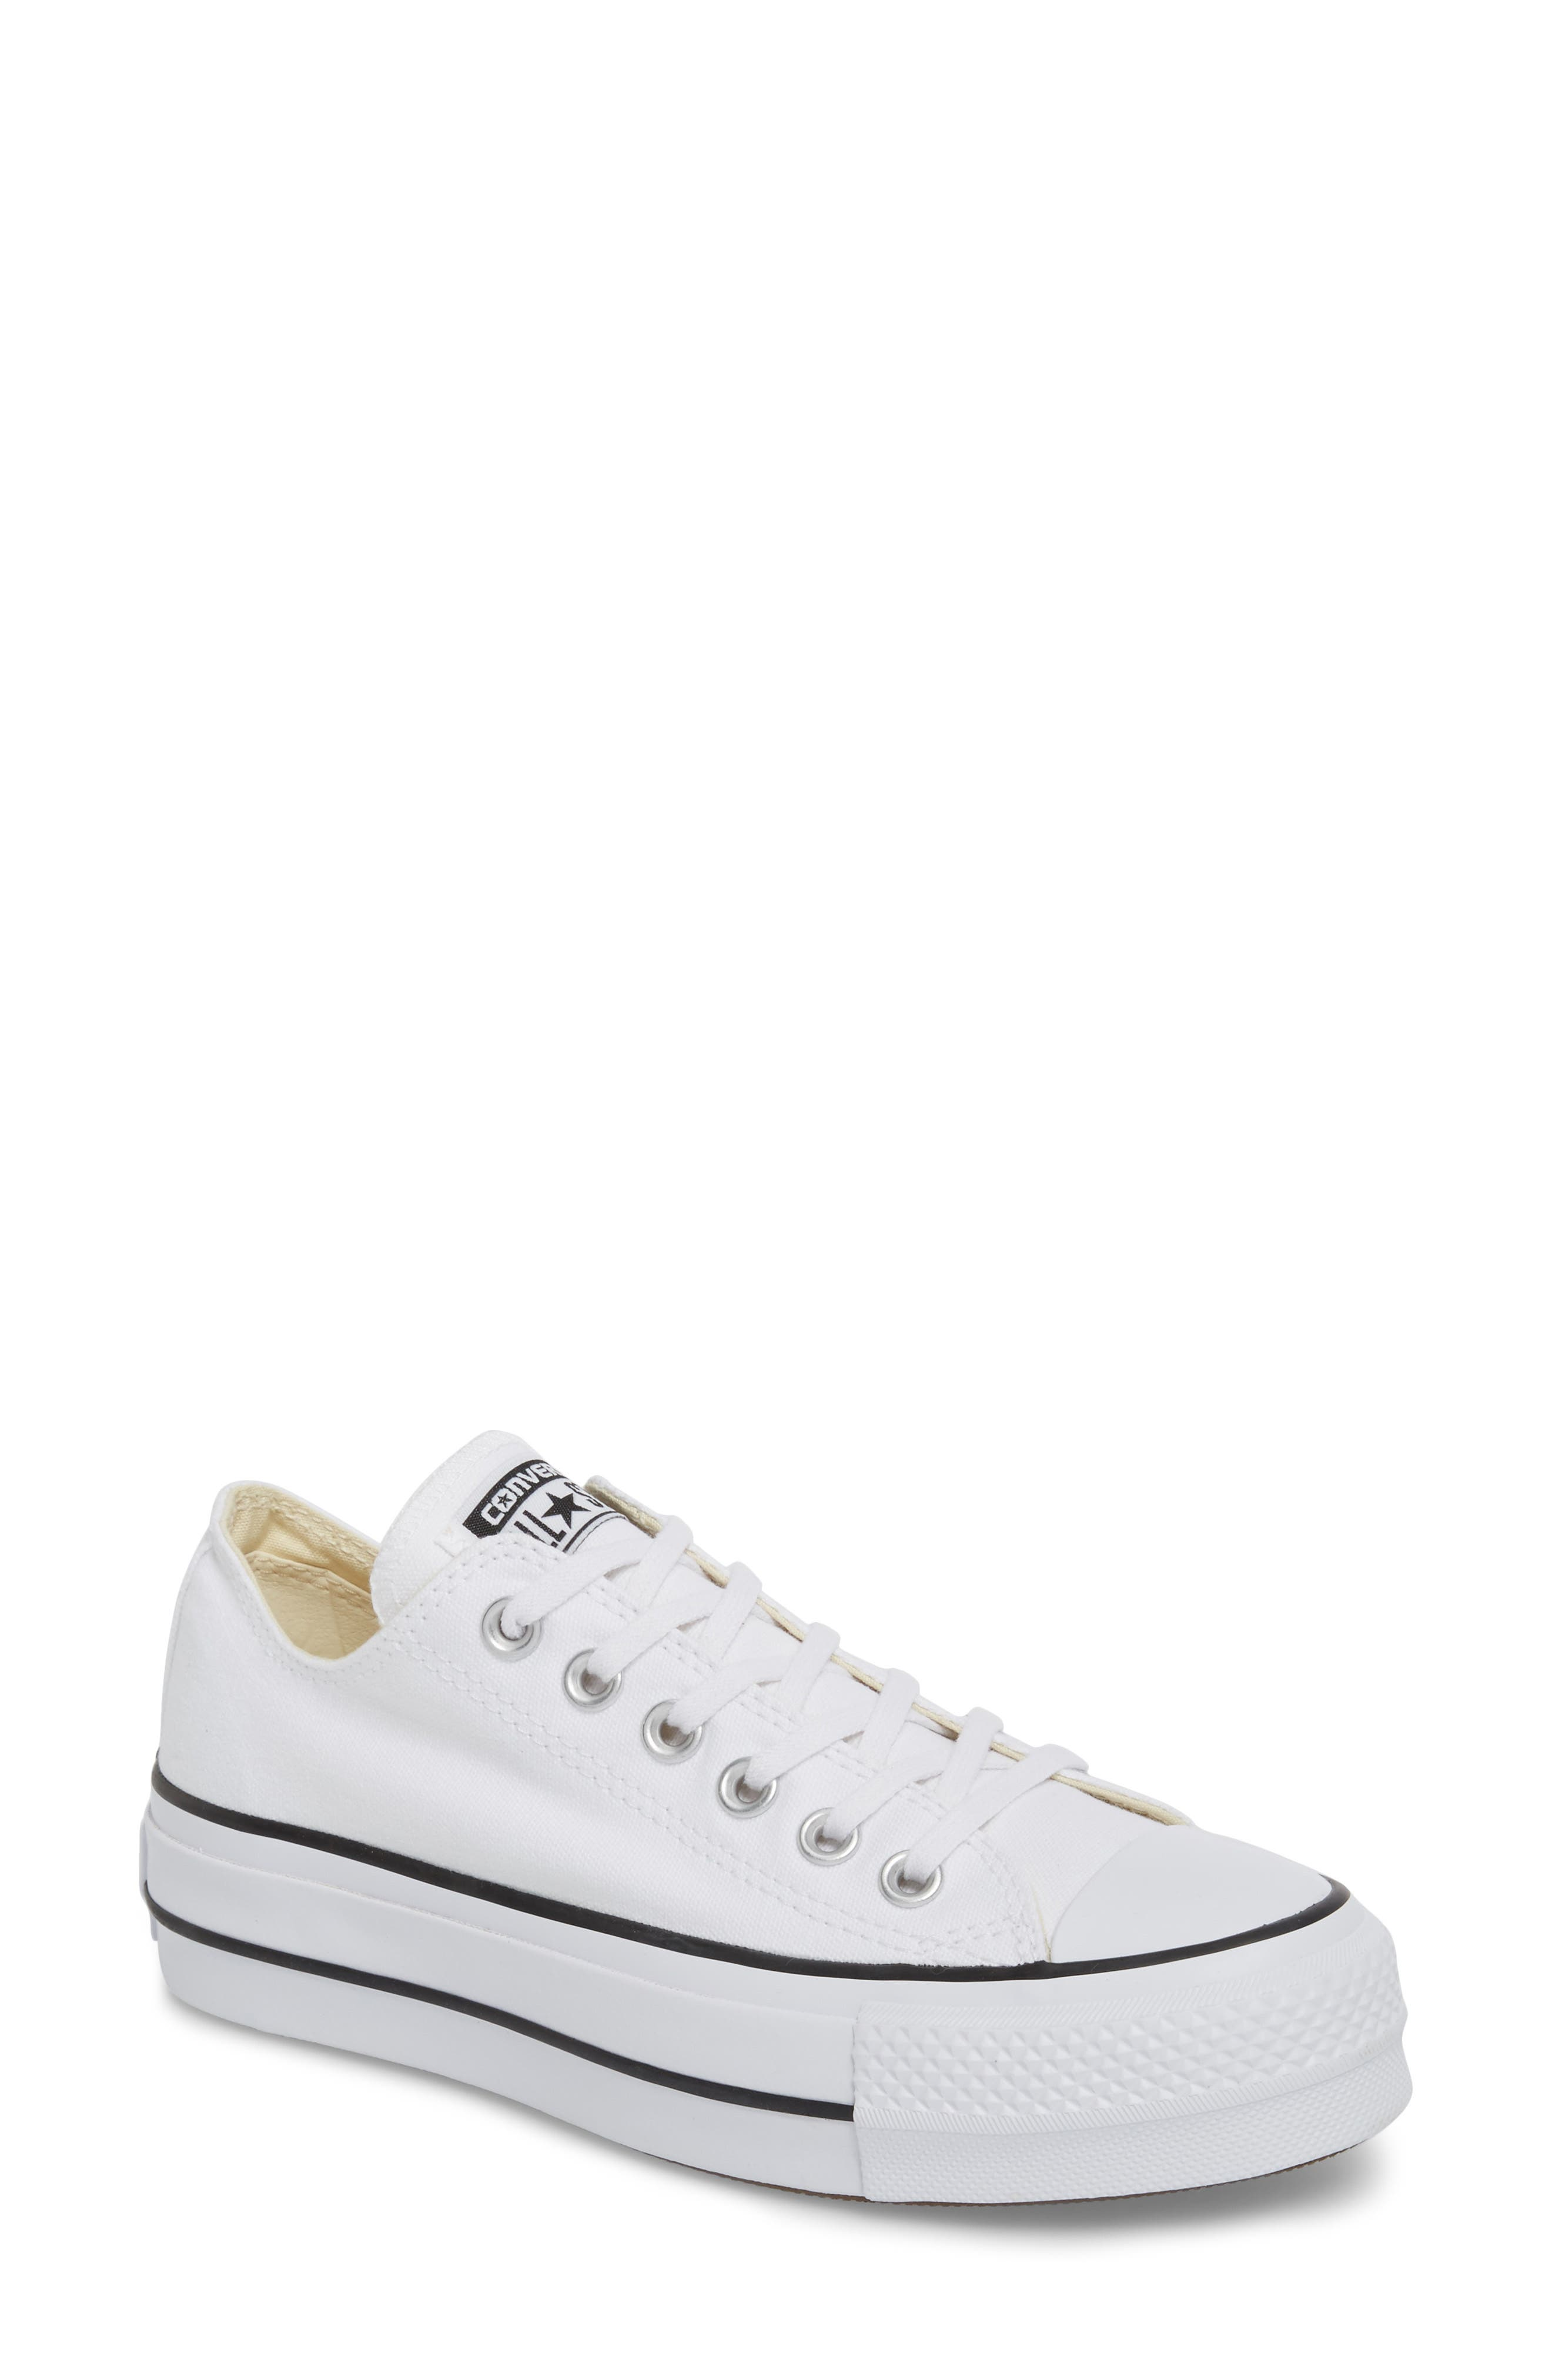 Chuck Taylor<sup>®</sup> All Star<sup>®</sup> Platform Sneaker,                             Main thumbnail 1, color,                             White/ Black/ White